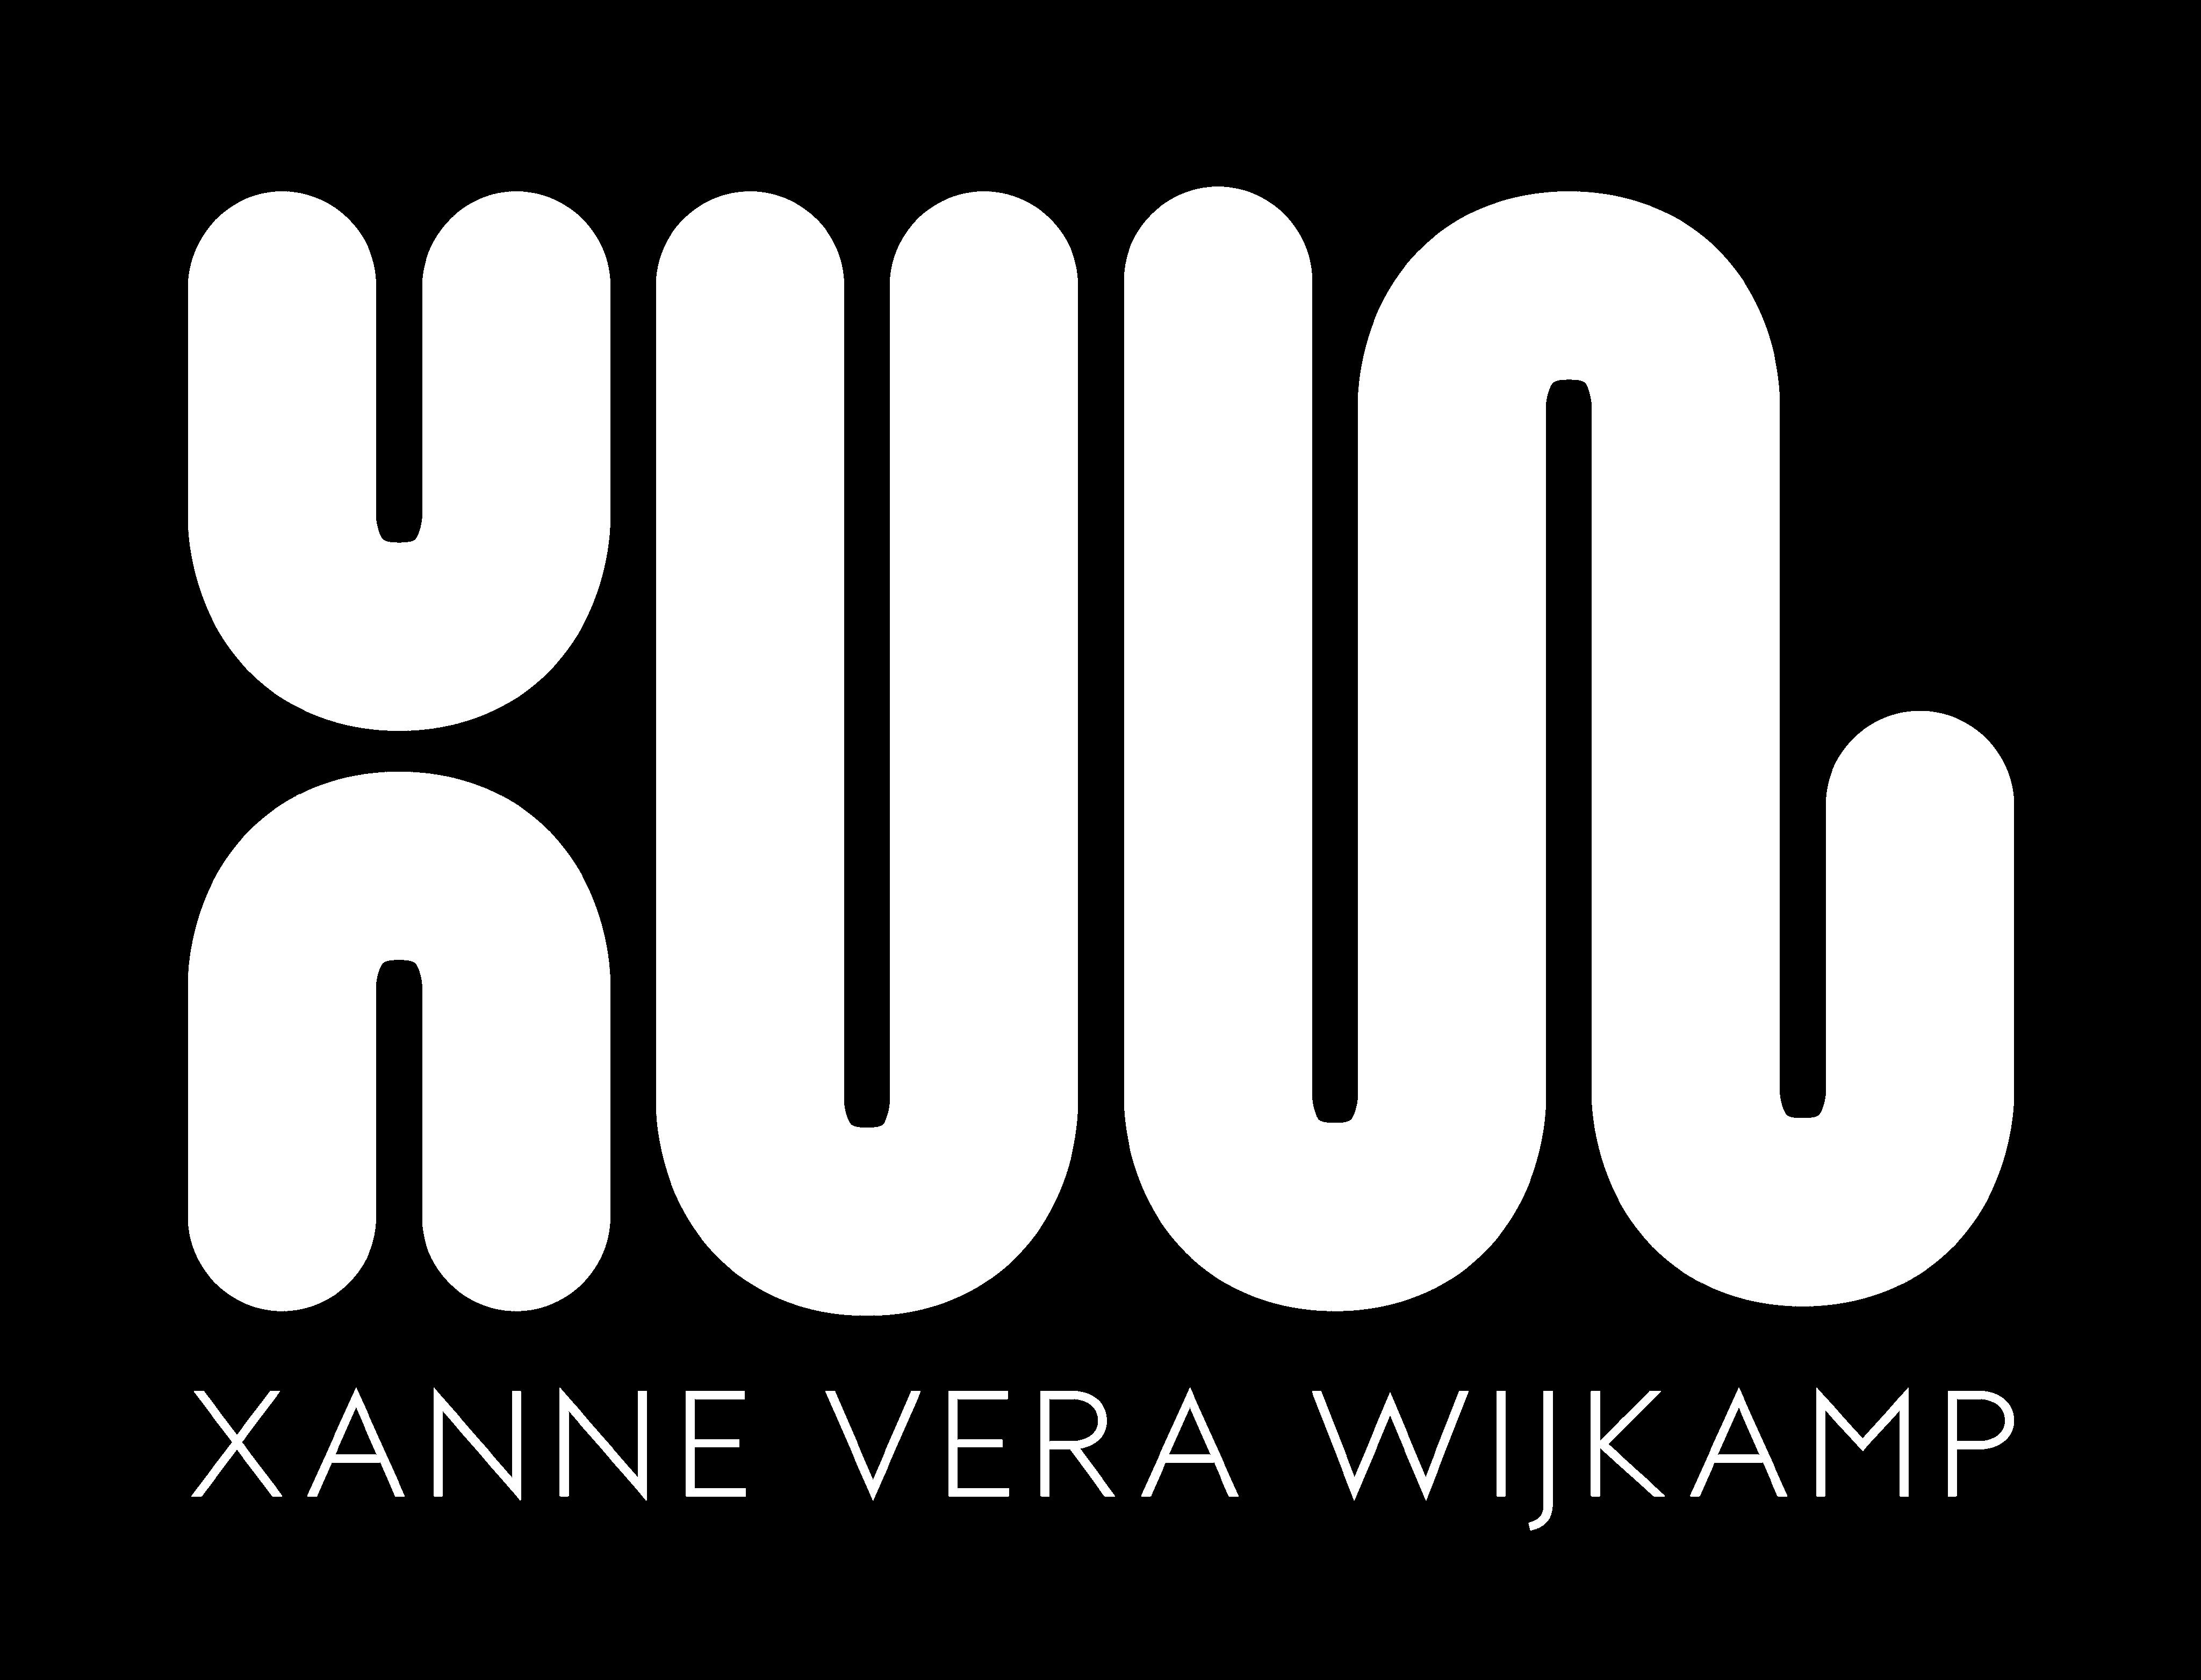 Xanne Vera